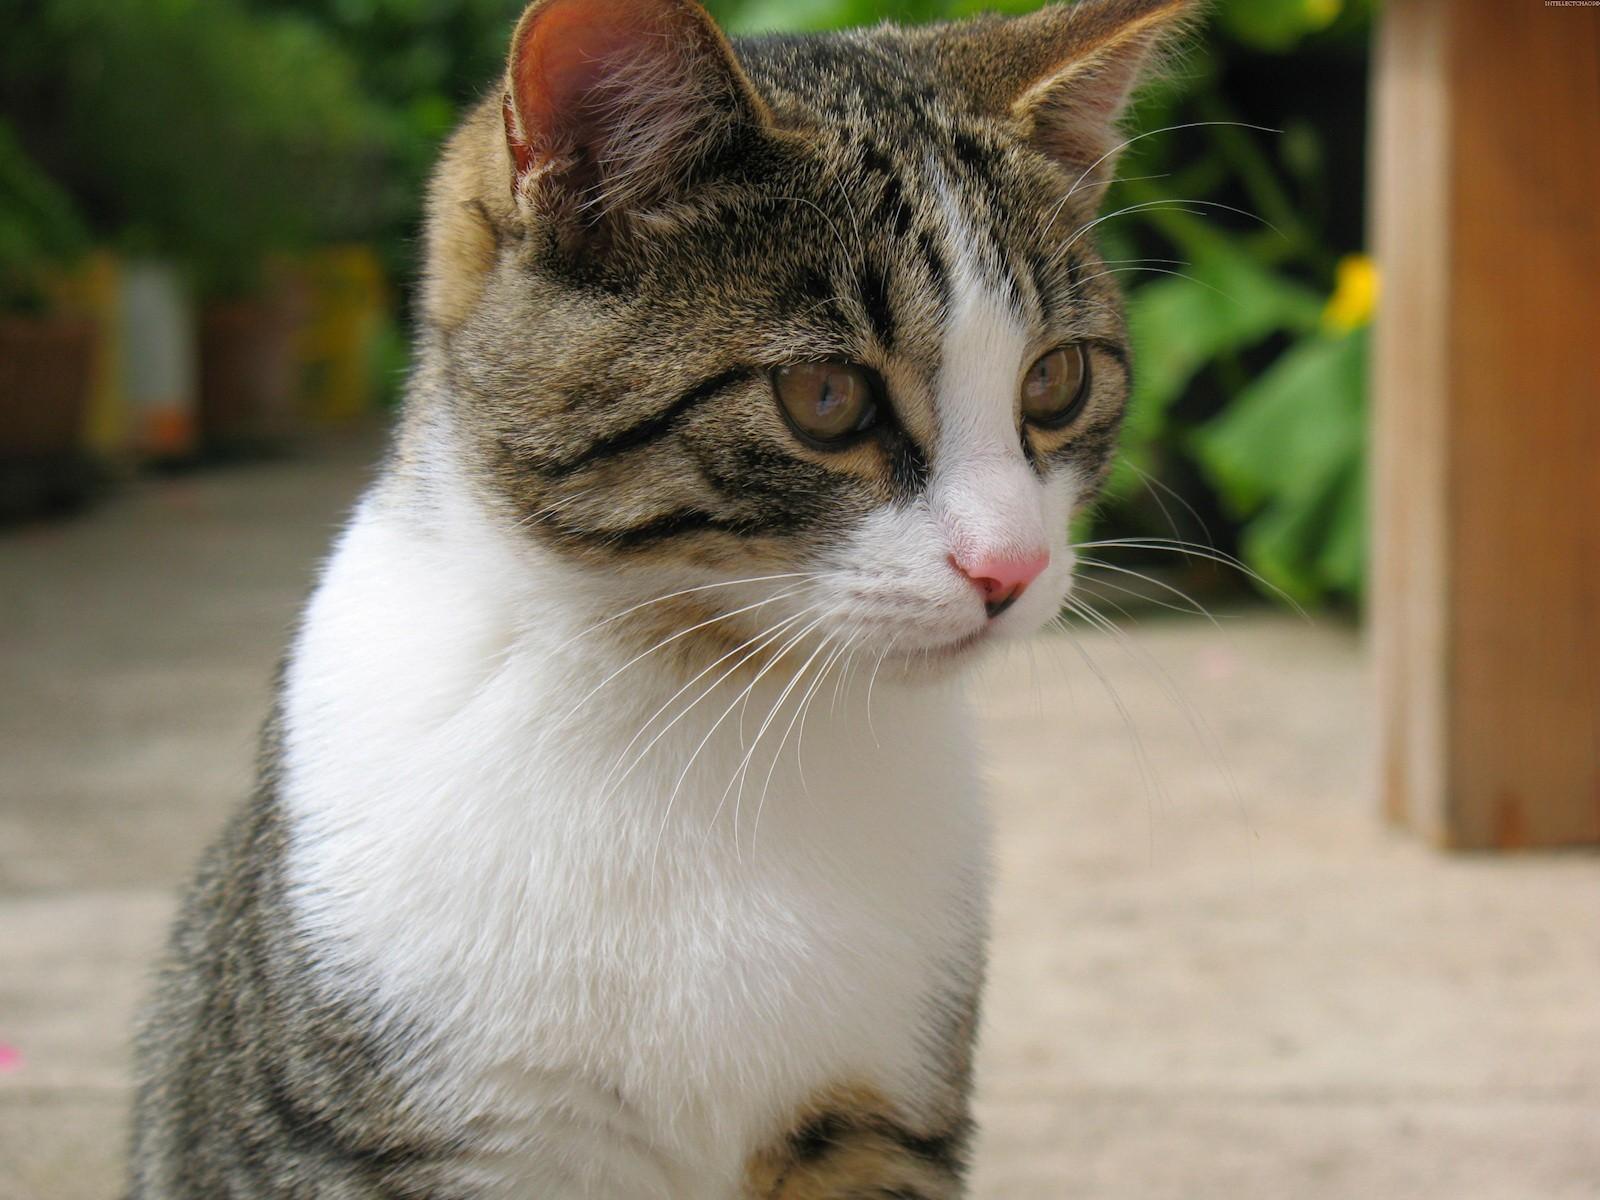 borla cat back exhaust